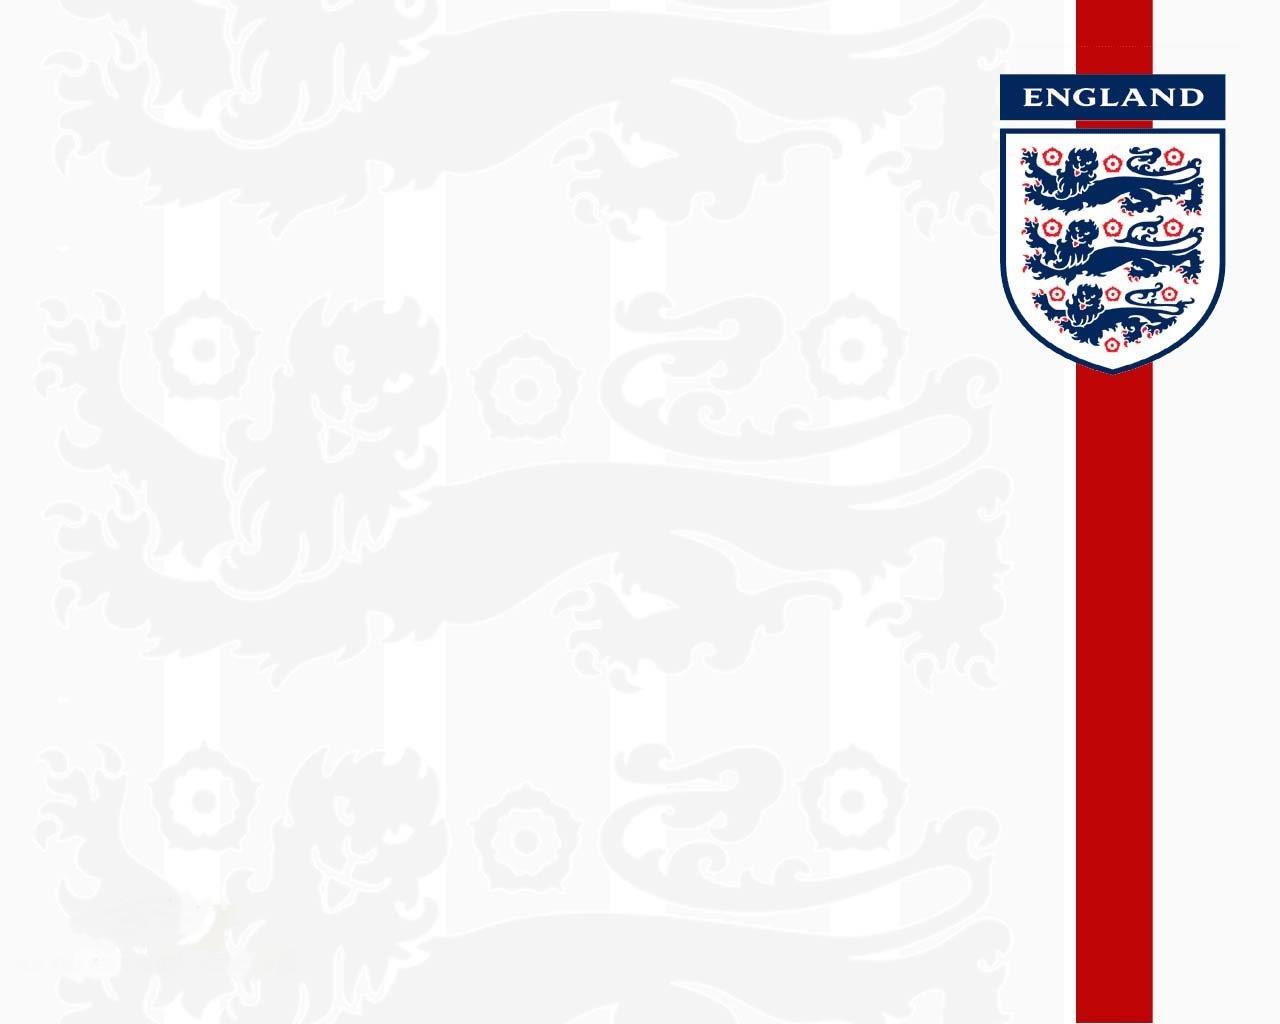 football national teams england wallpapers 3771 22 wallpaper id 326 1280x1024